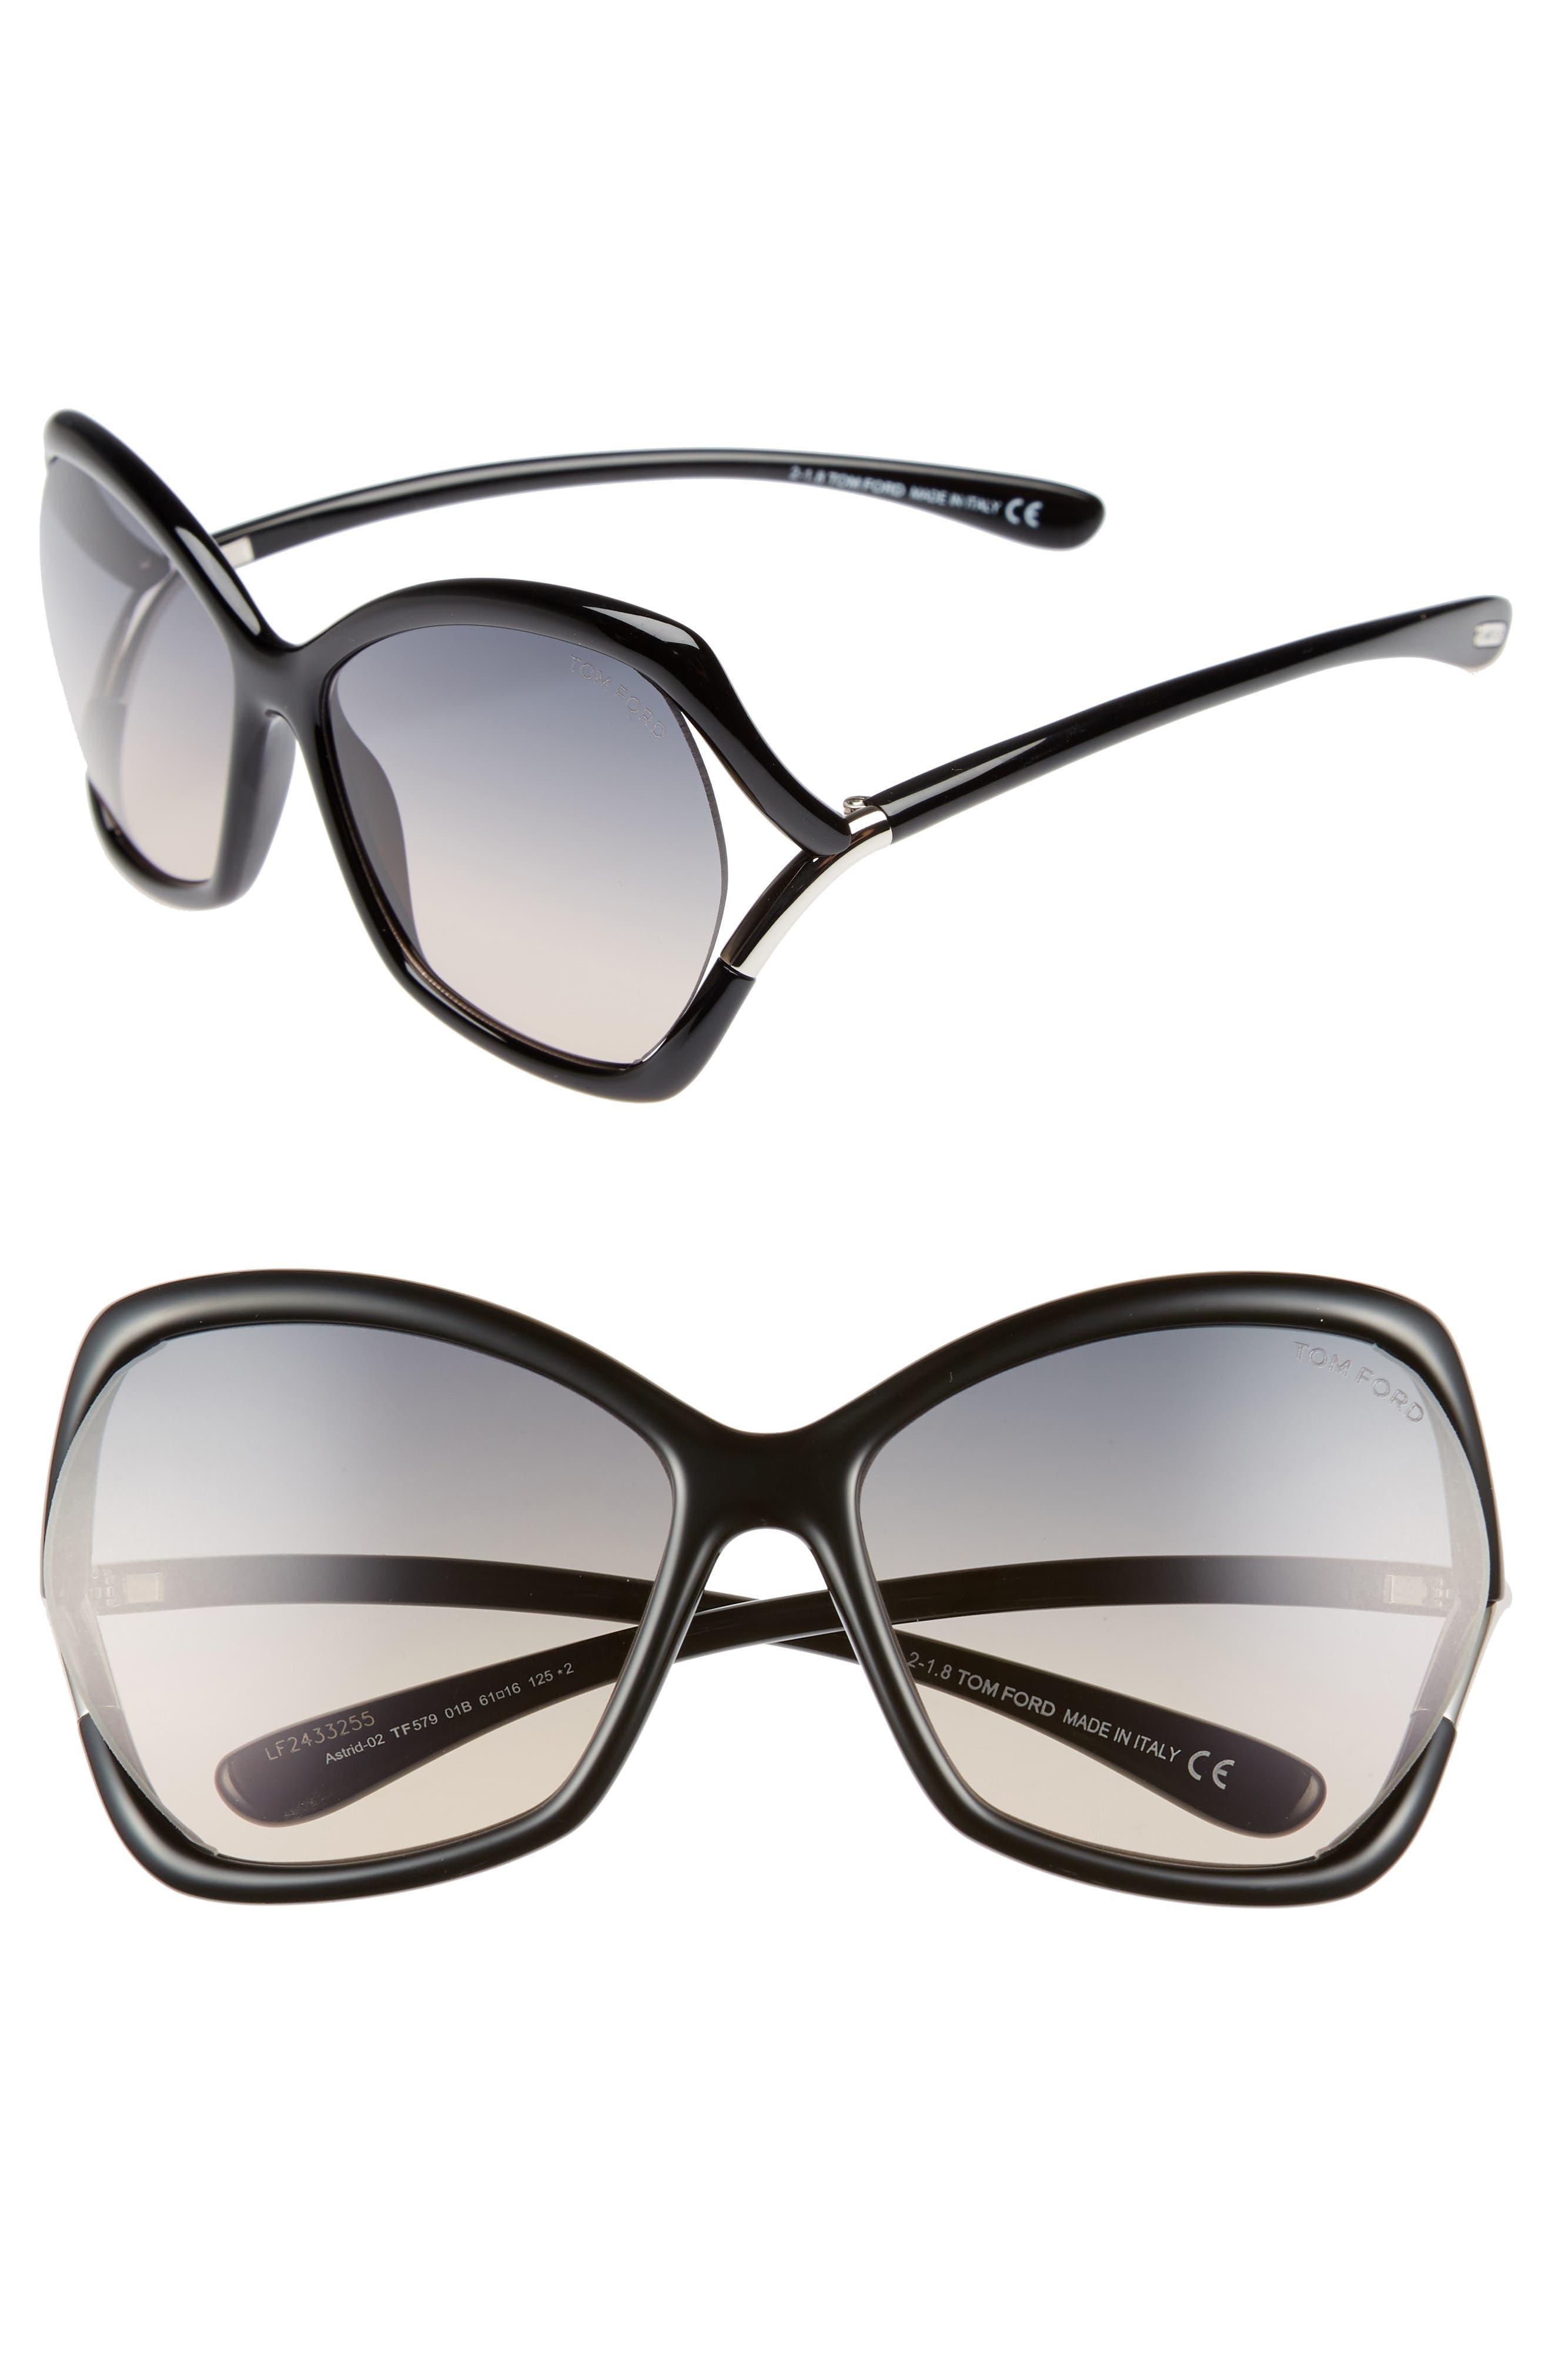 Astrid 61mm Geometric Sunglasses,                         Main,                         color, SHINY BLACK/ GRADIENT SMOKE